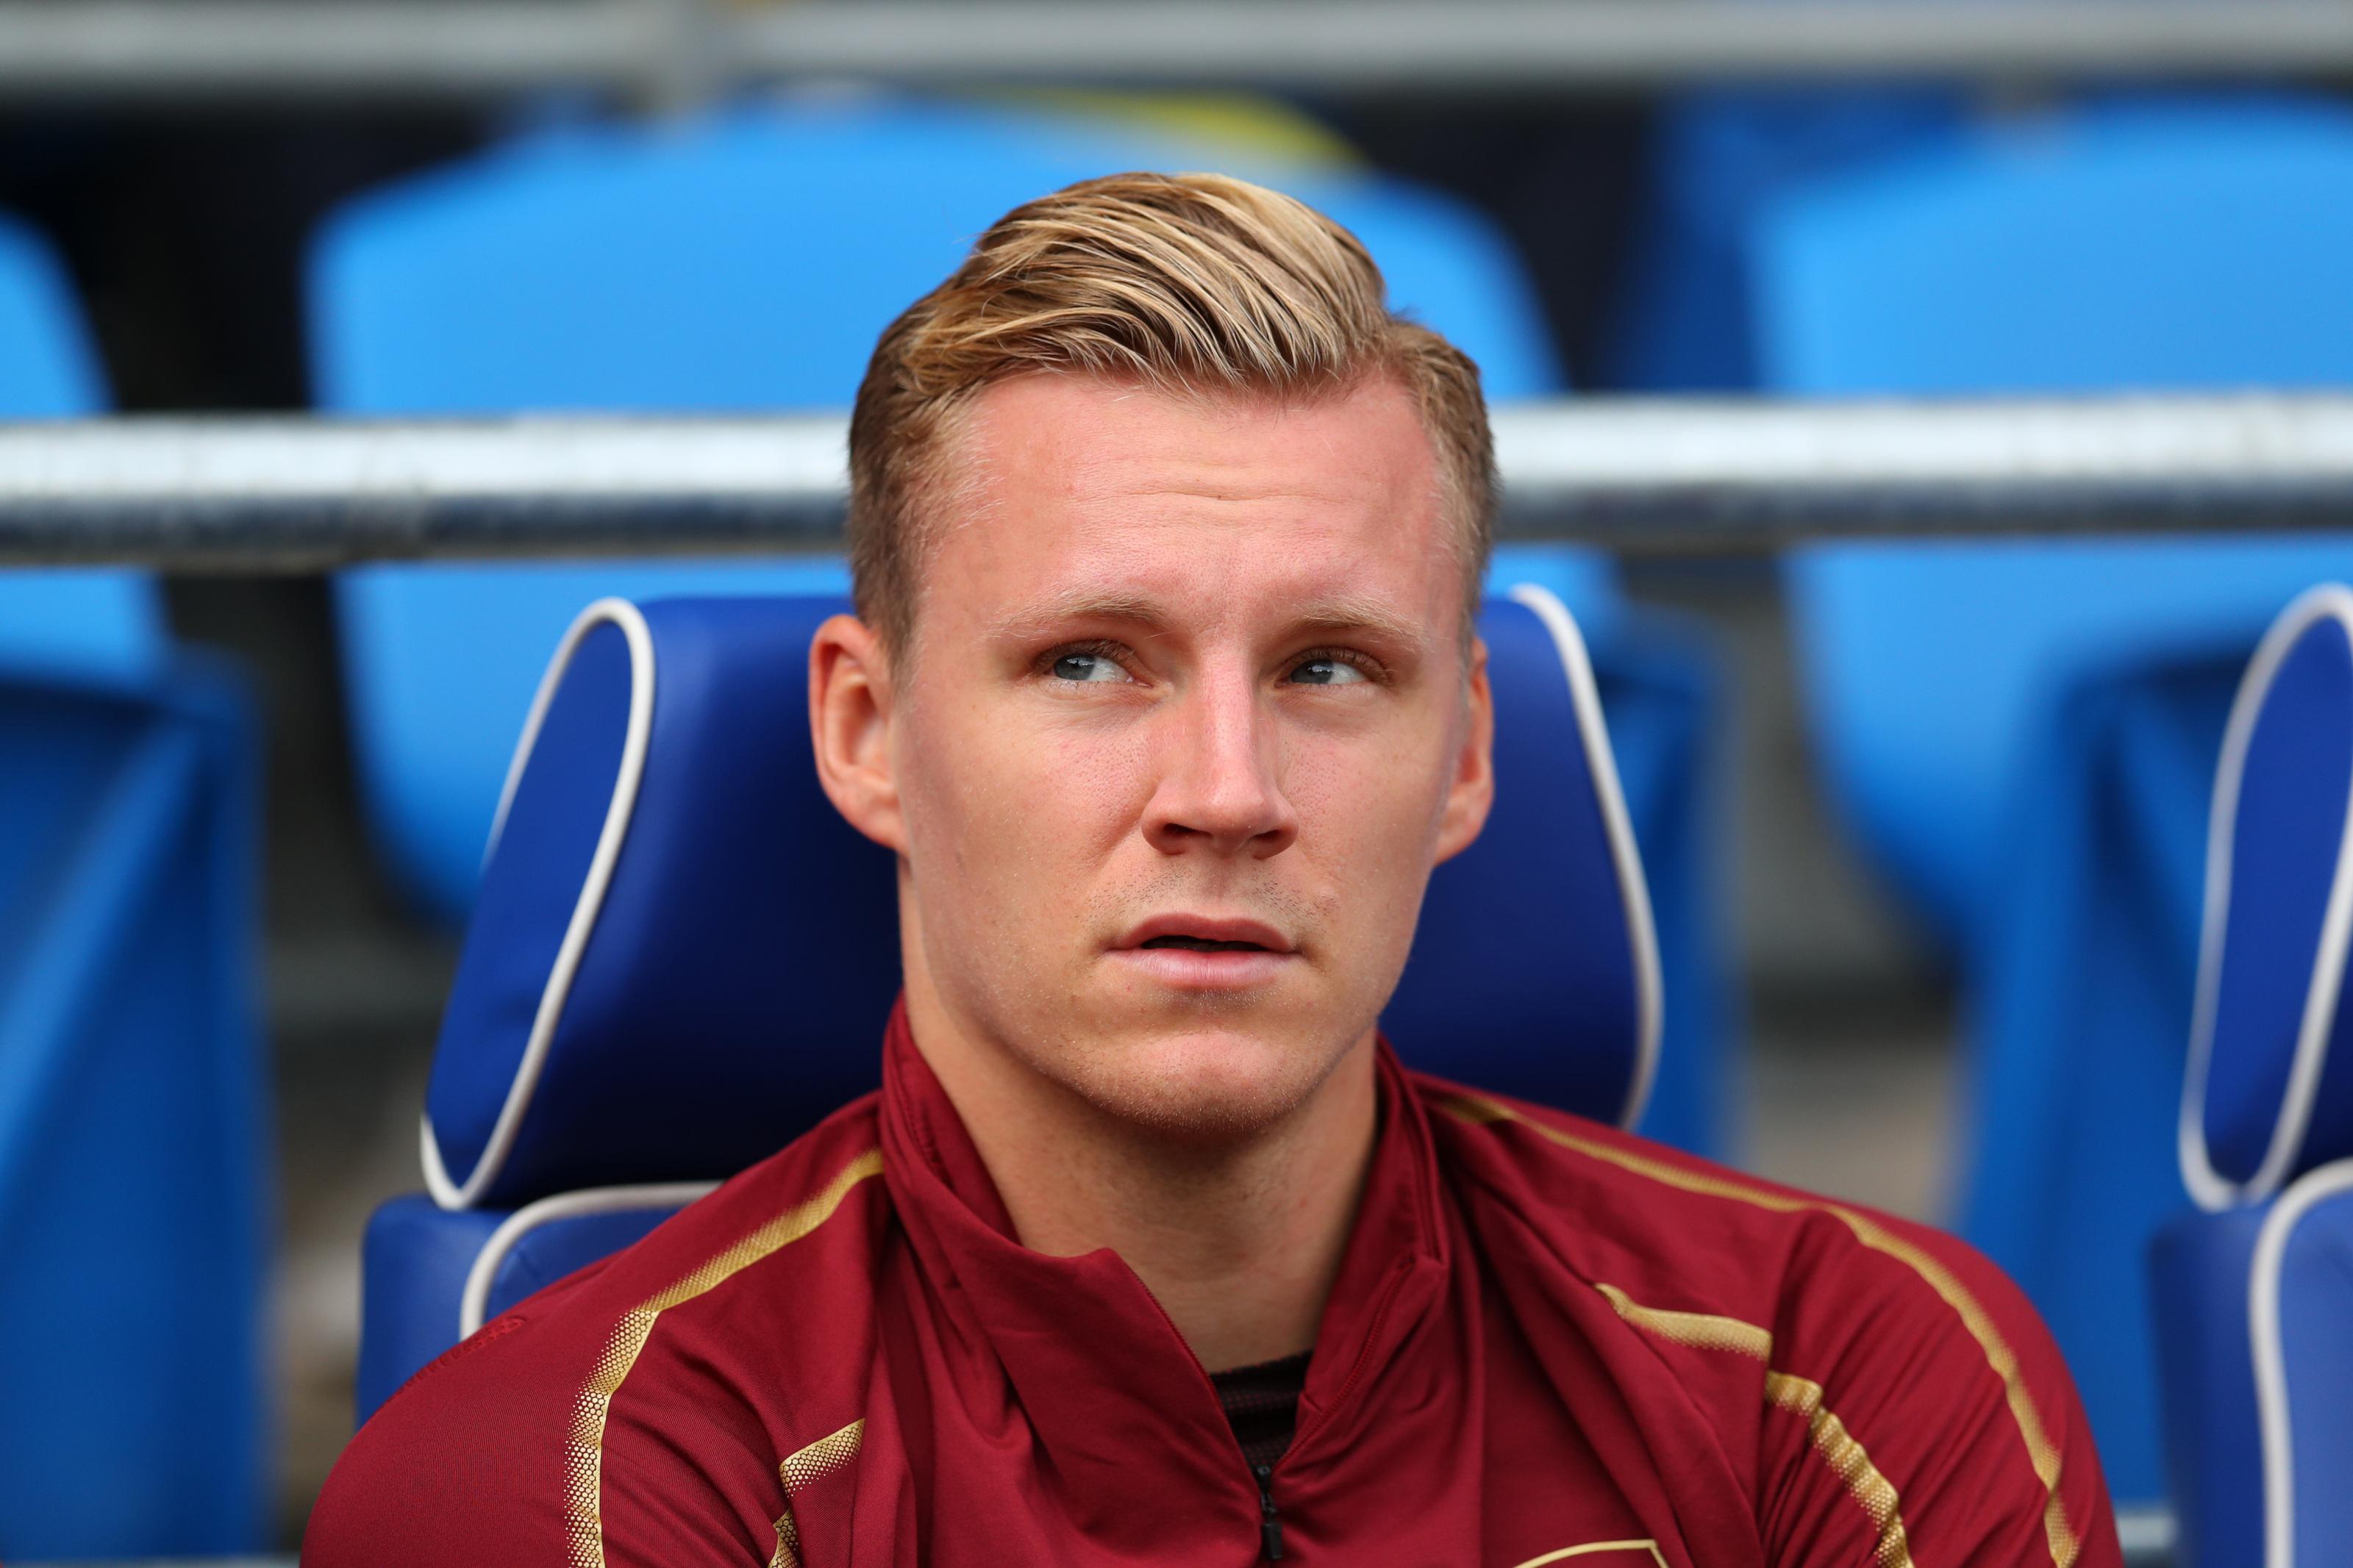 Arsenal: Bernd Leno said a lot more than 'frustrated'